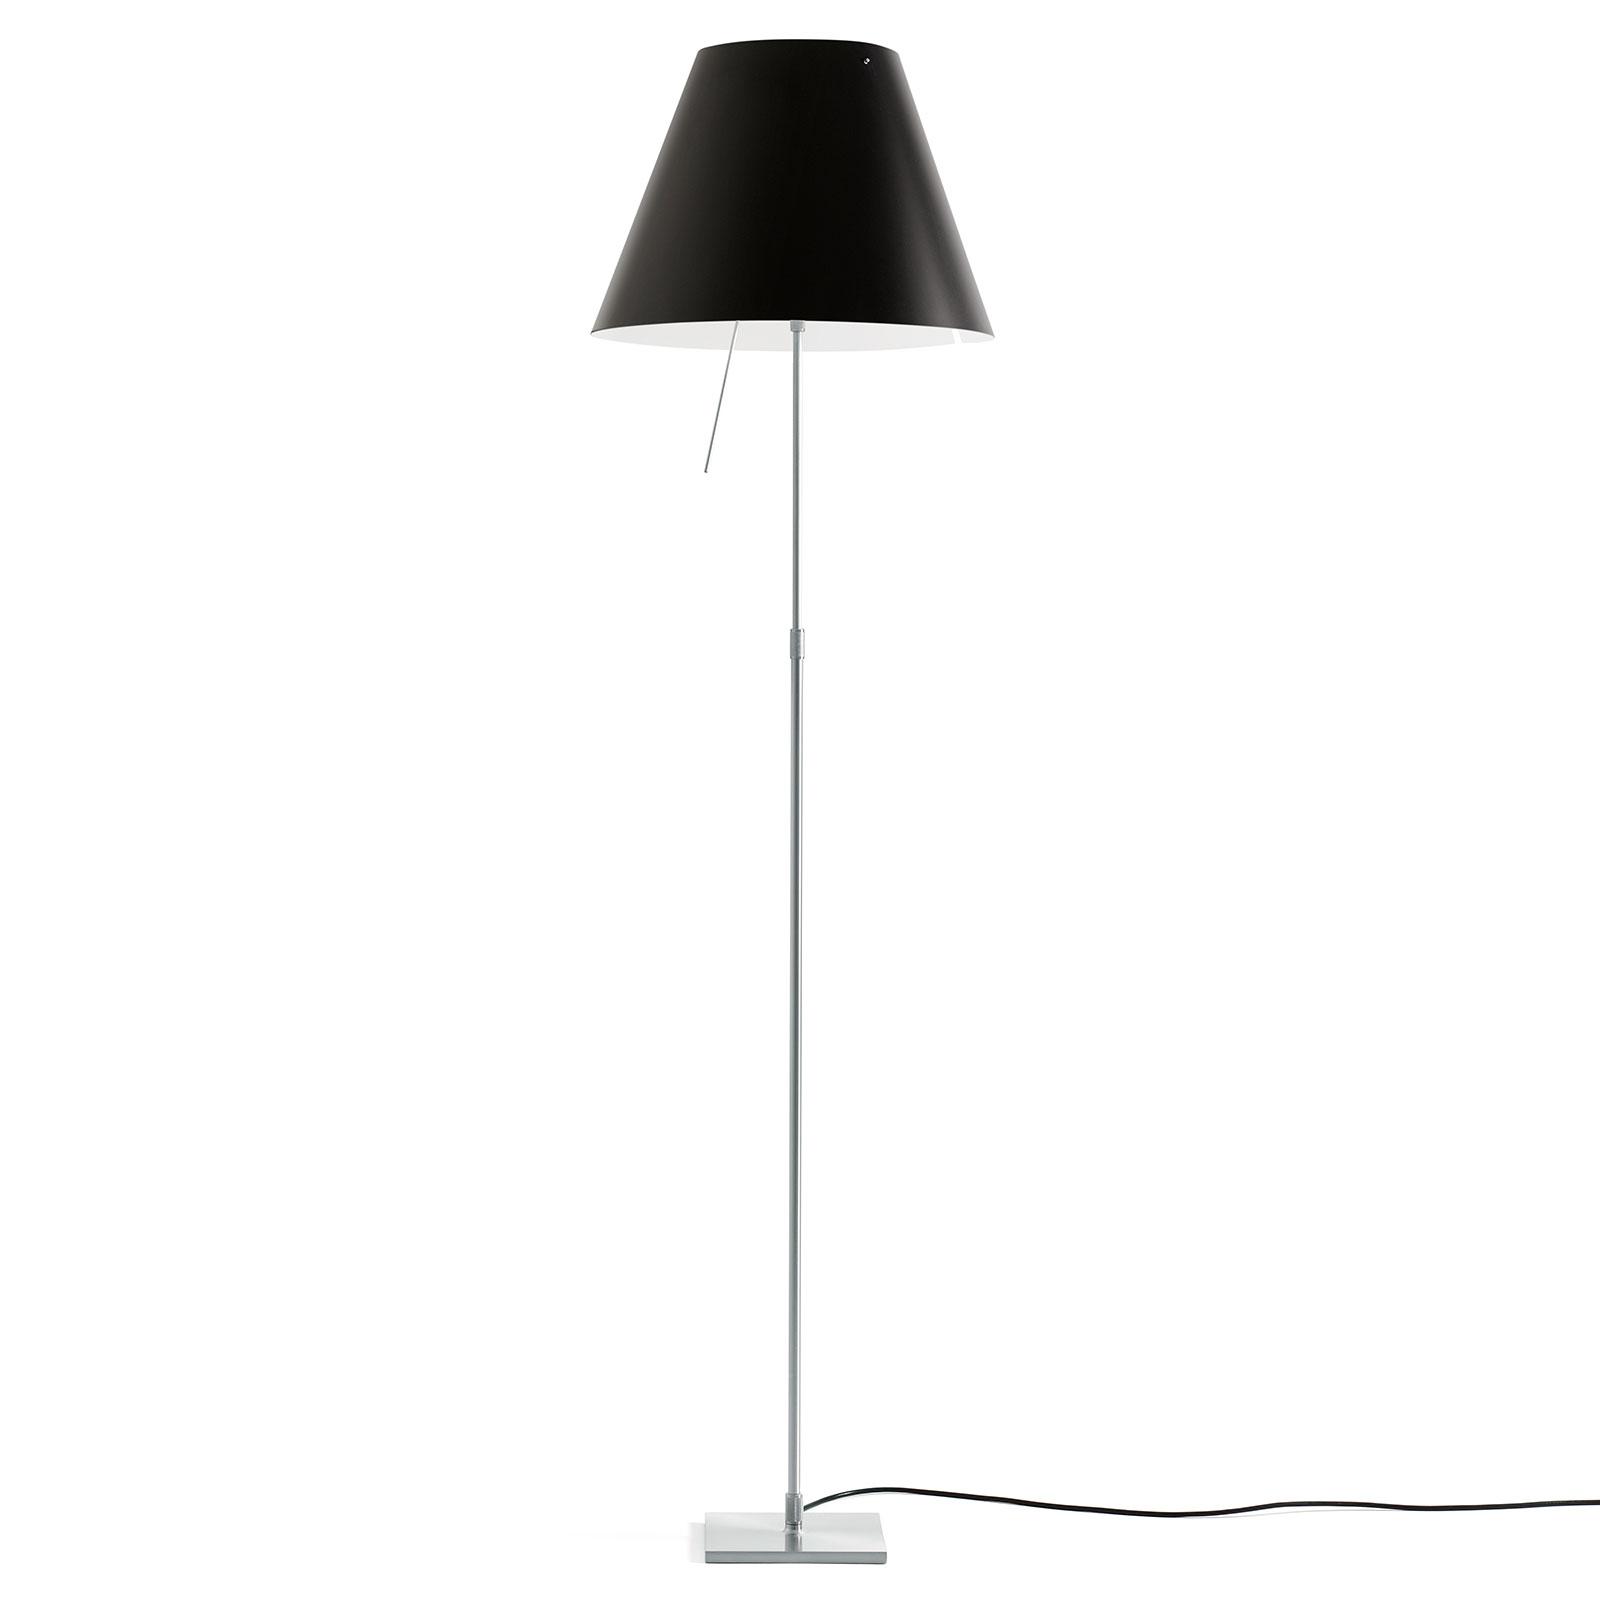 Luceplan Costanza vloerlamp D13ti, alu/zwart